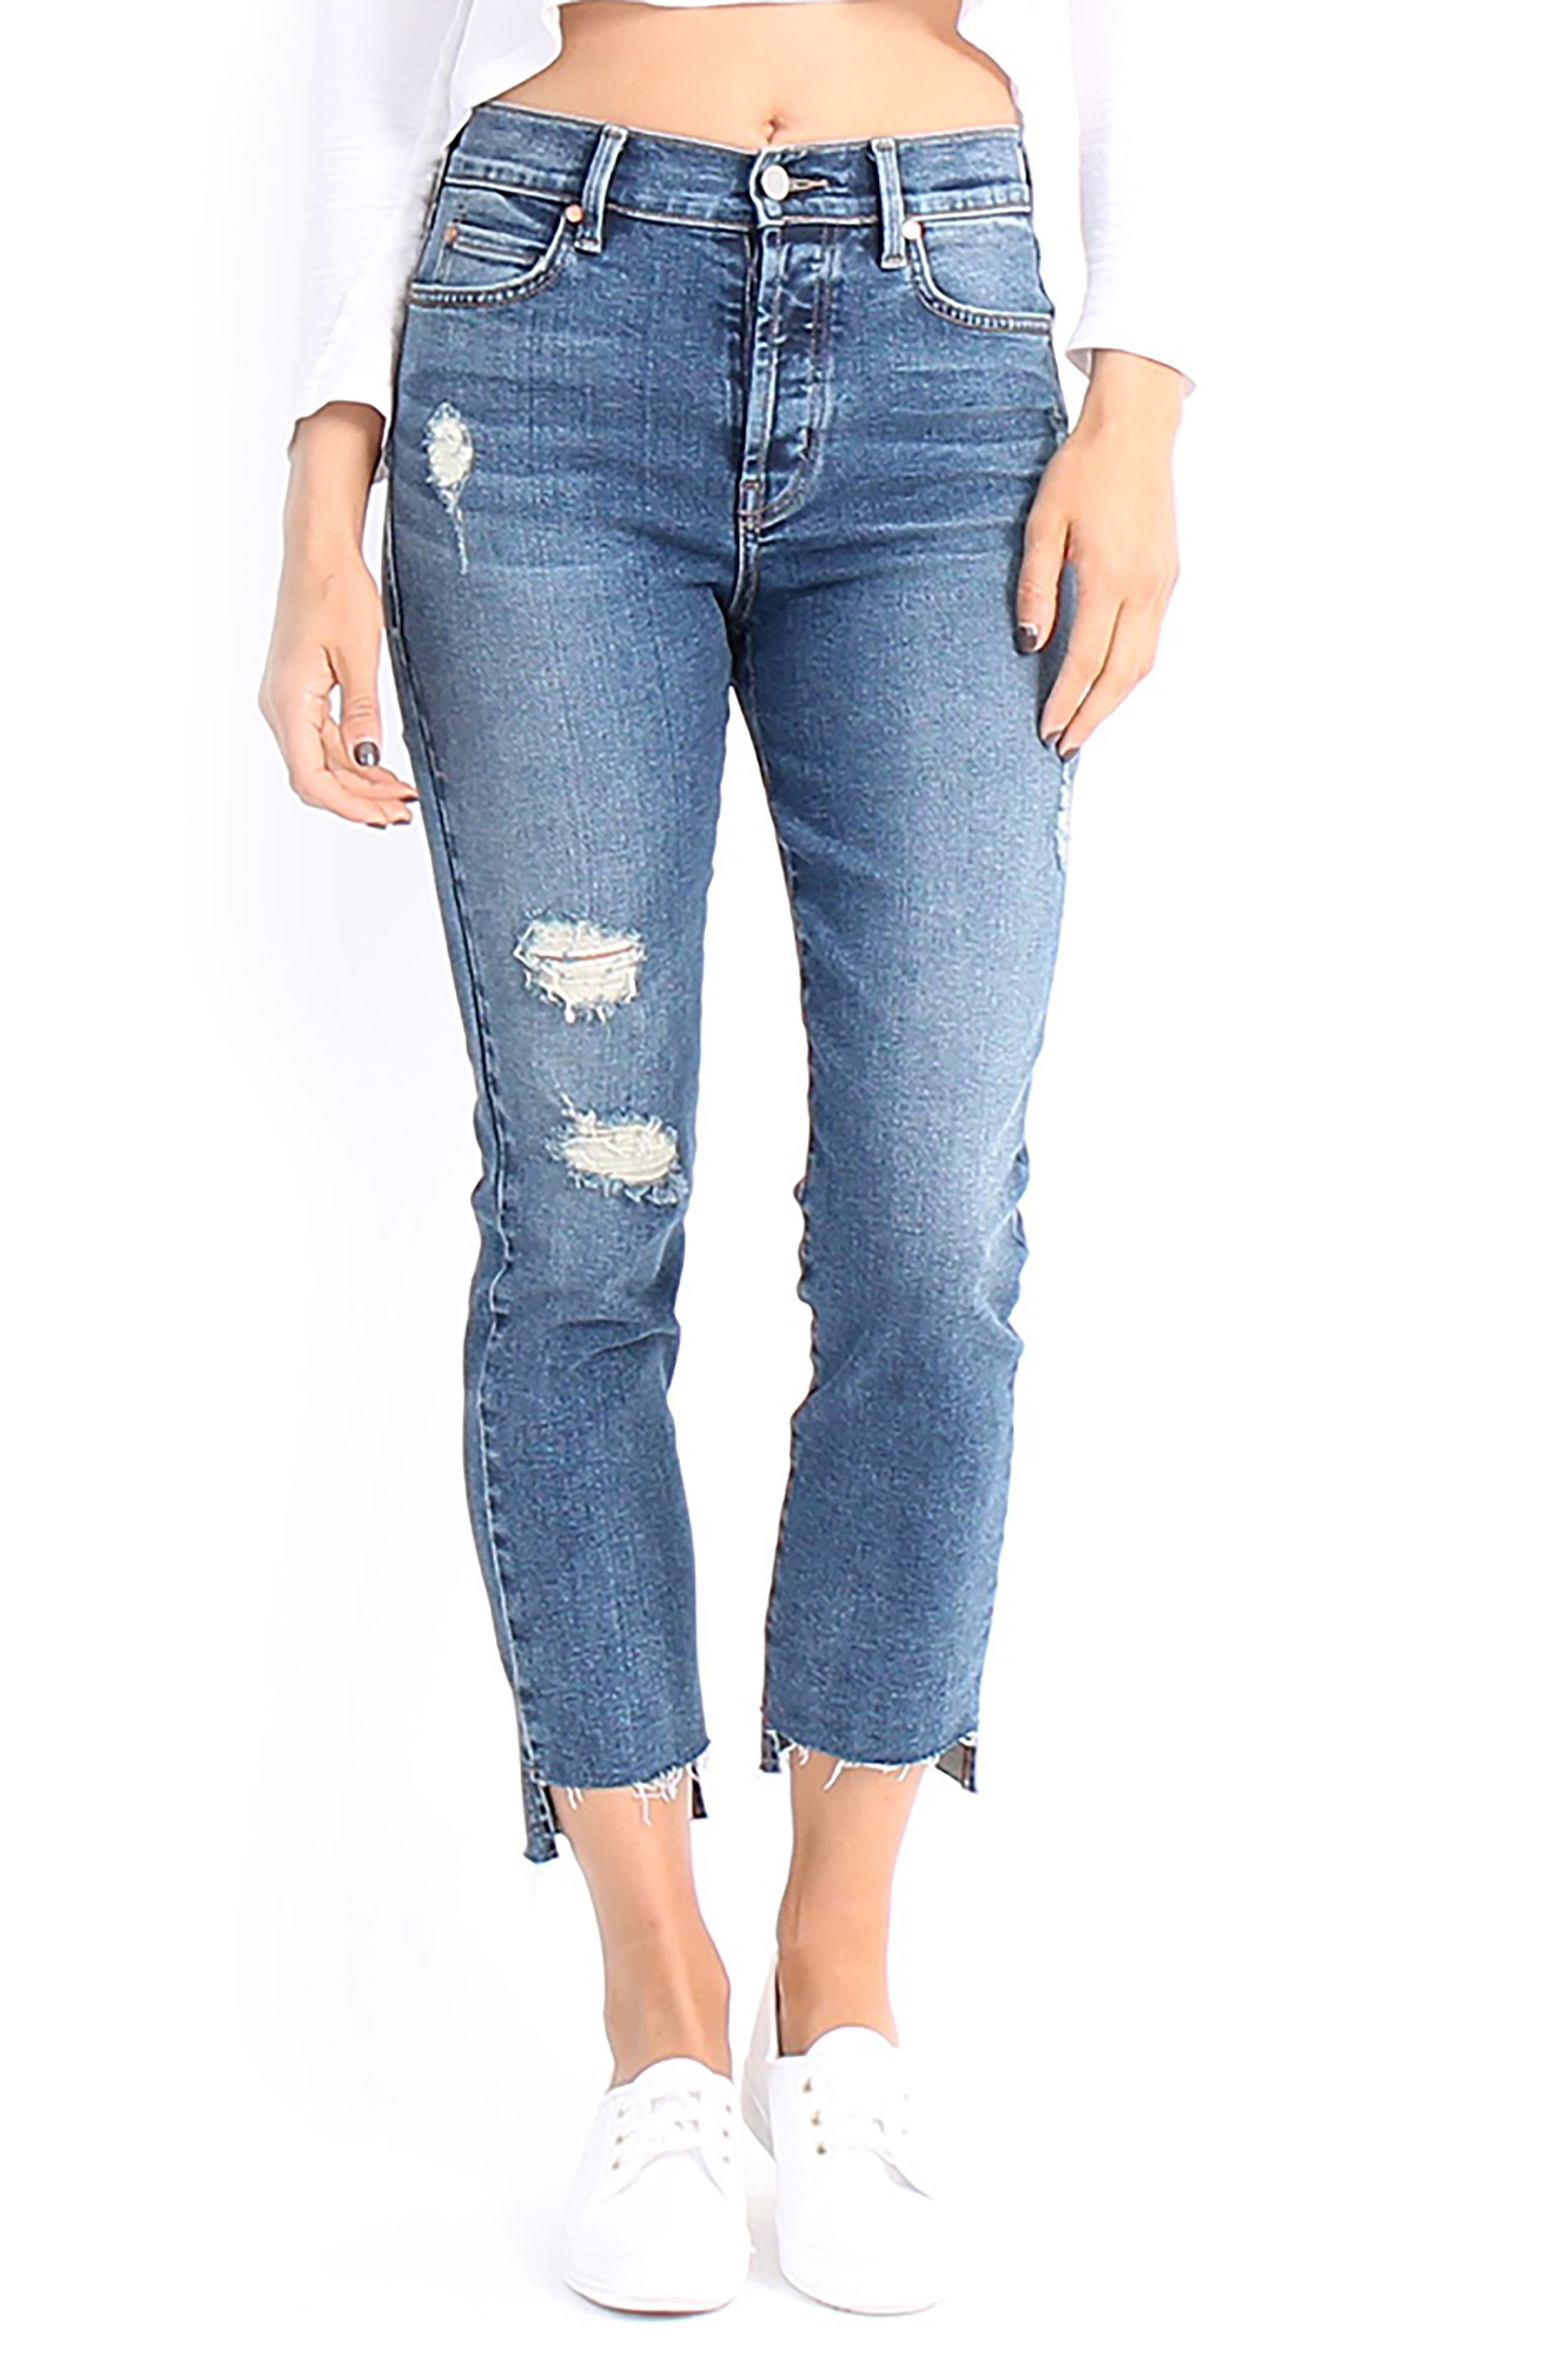 Skylar High-Waist Step Hem Distressed Jeans,                             Main thumbnail 1, color,                             Allure